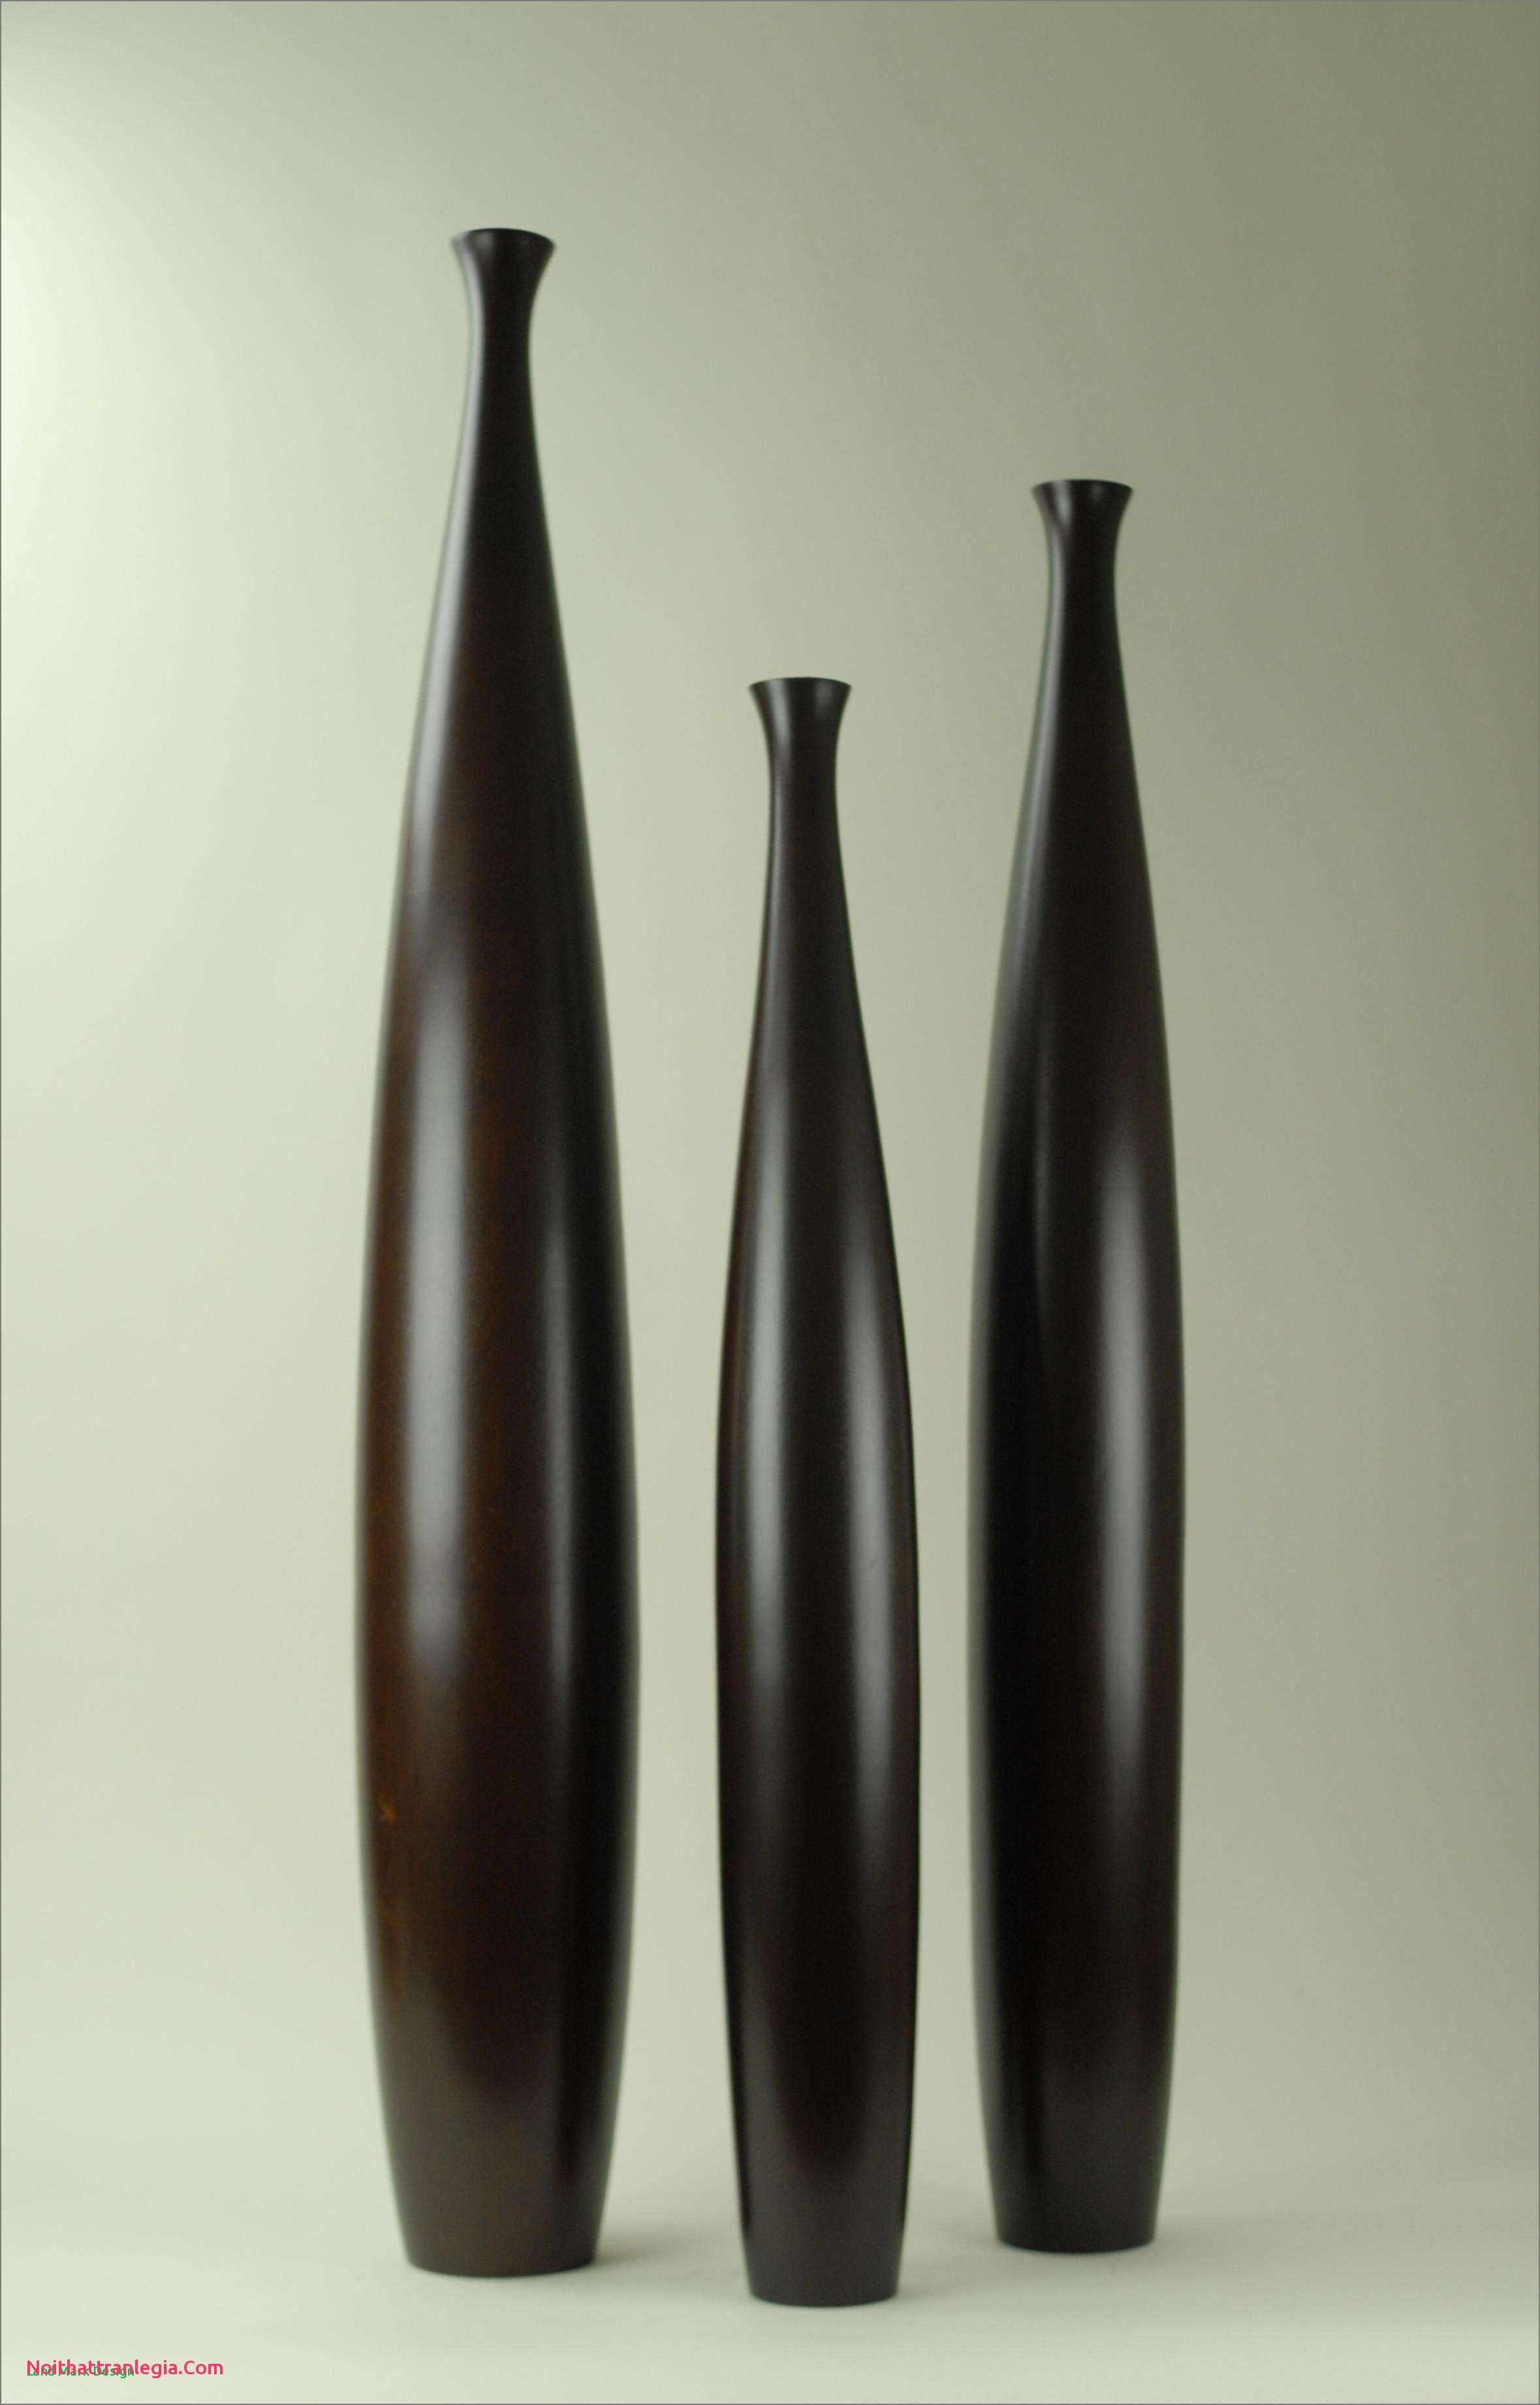 Lime Green Floor Vase Of 20 Large Floor Vase Nz Noithattranlegia Vases Design with Floor Vases Ikea Collection Ikea Floor Vases Design